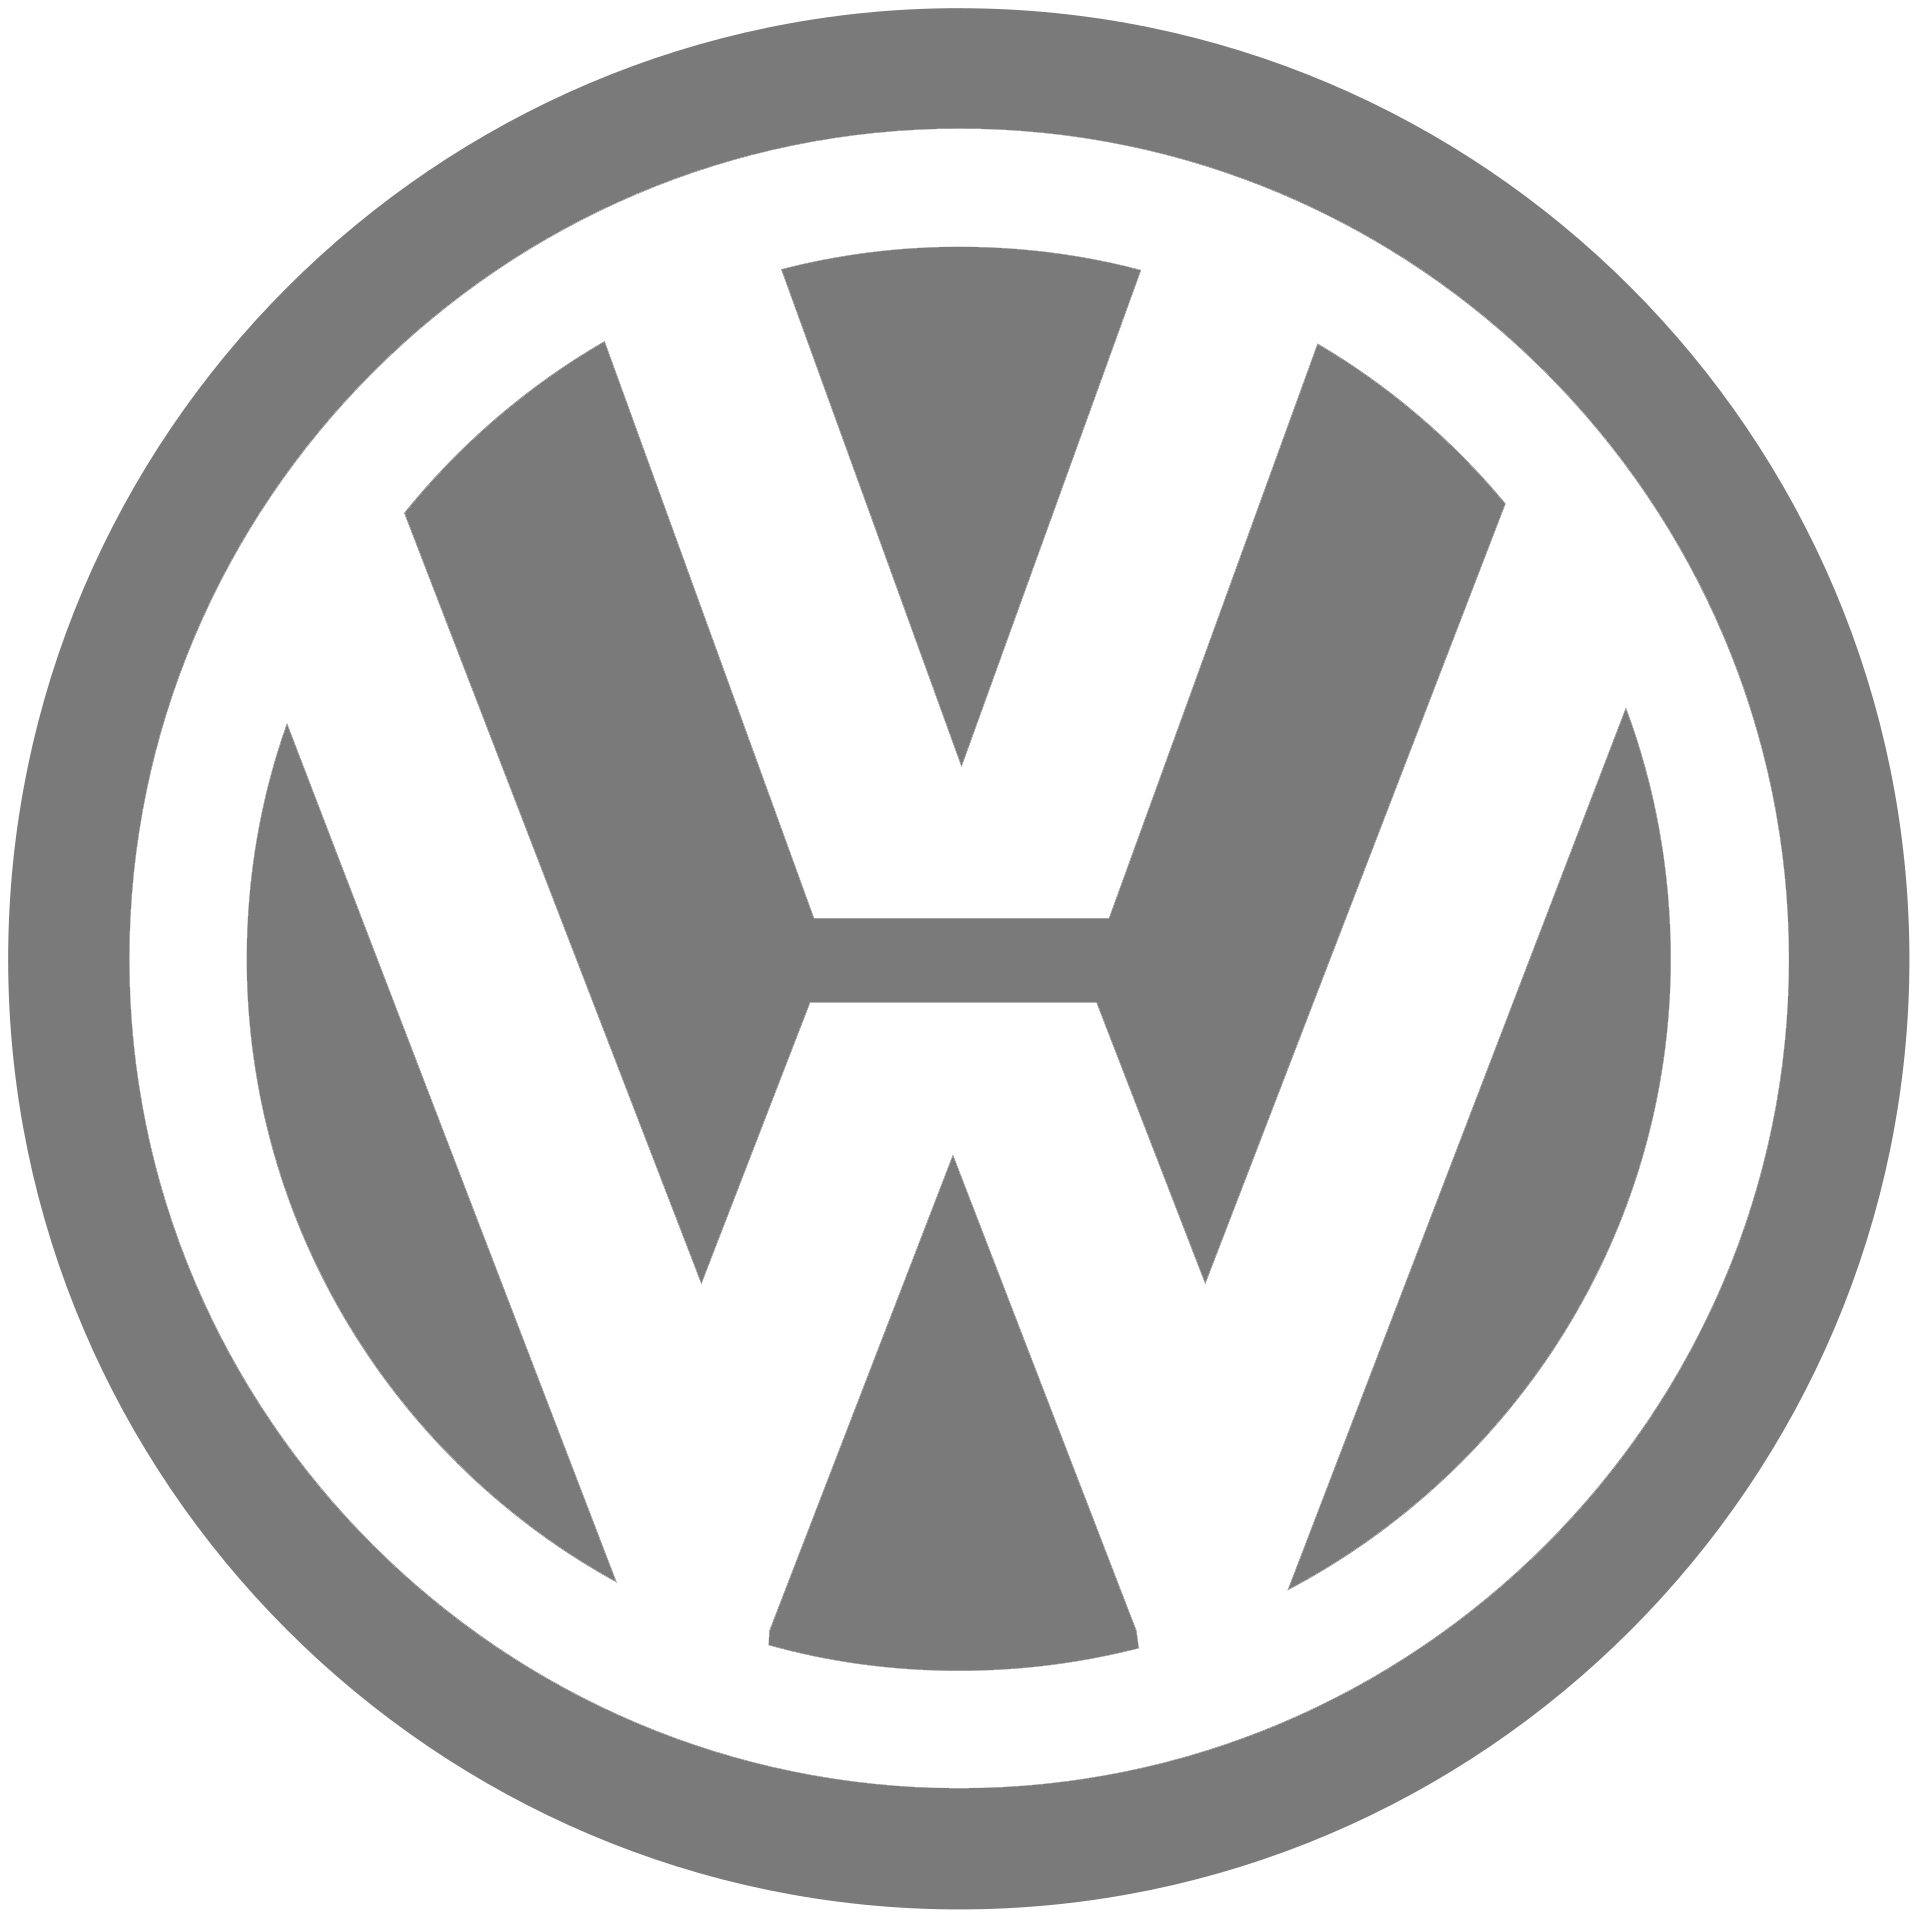 Referenz Volkswagen